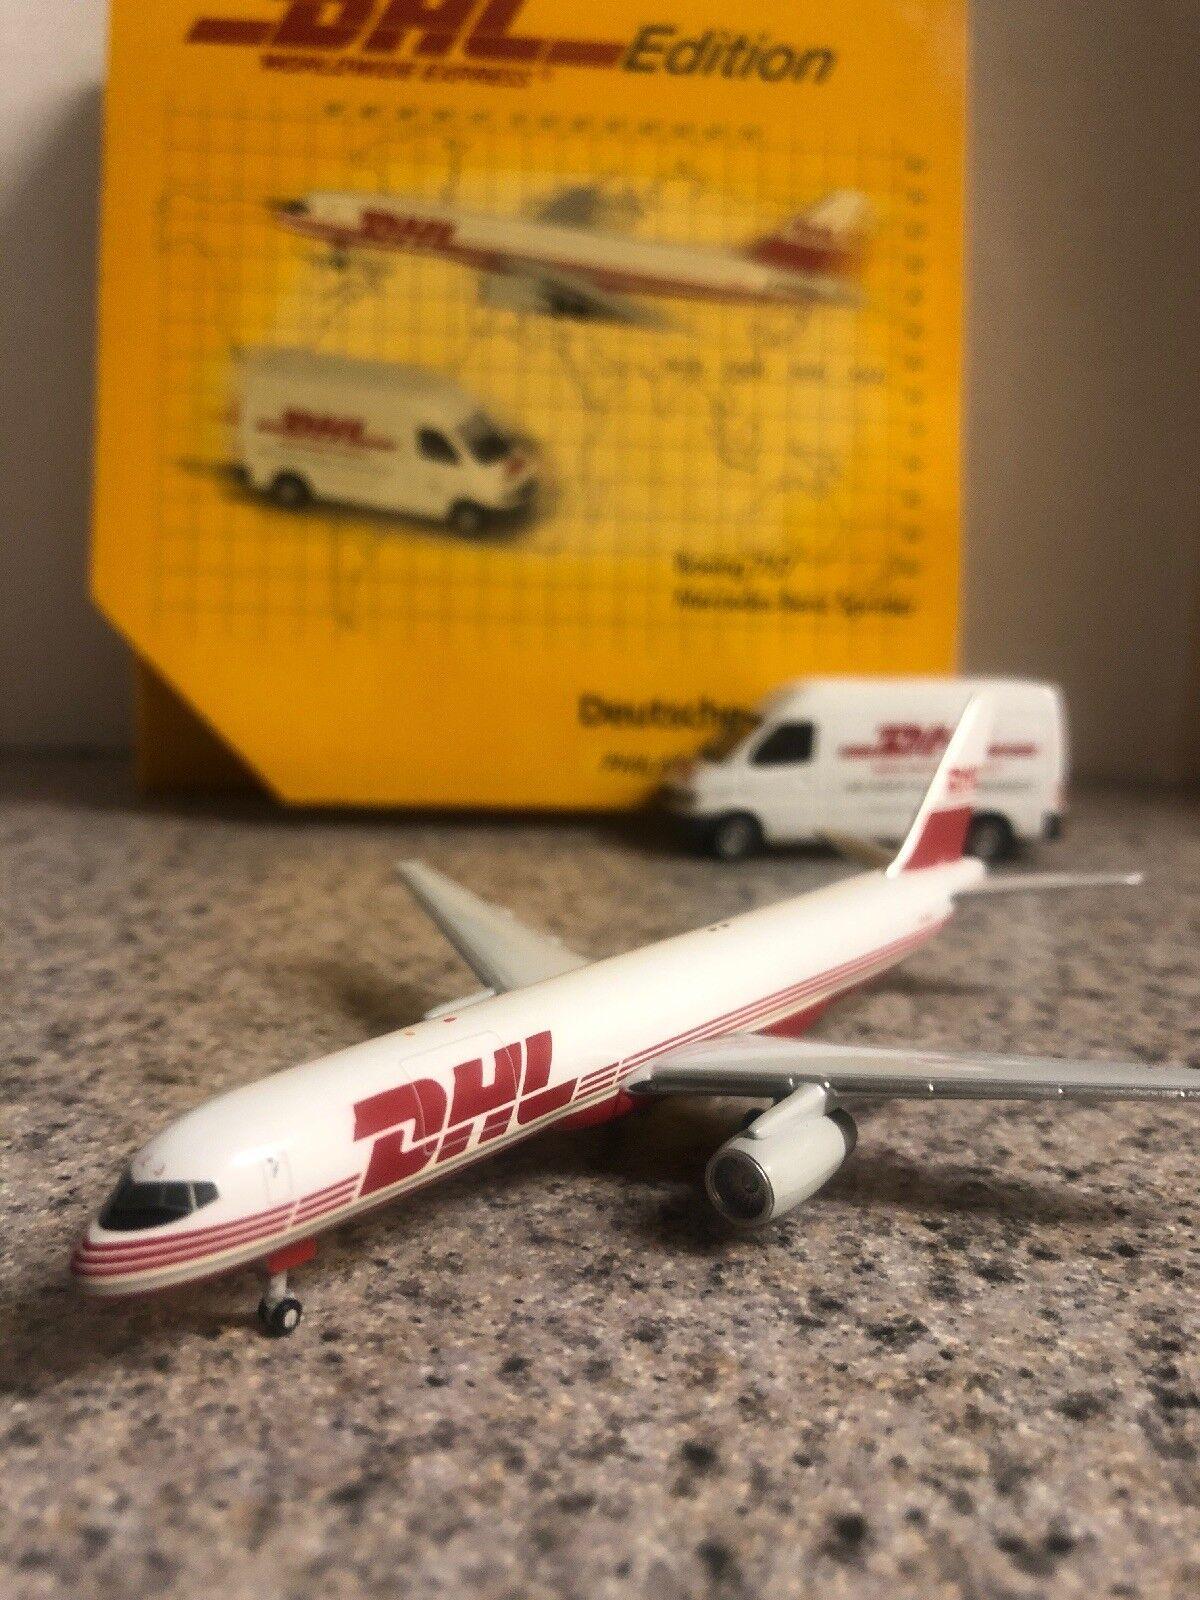 hasta un 50% de descuento Gj Limited Edition 400 escala escala escala Diecast Modelo DHL B757-2SF & Benz Van comercial avión OO-DLJ  online barato